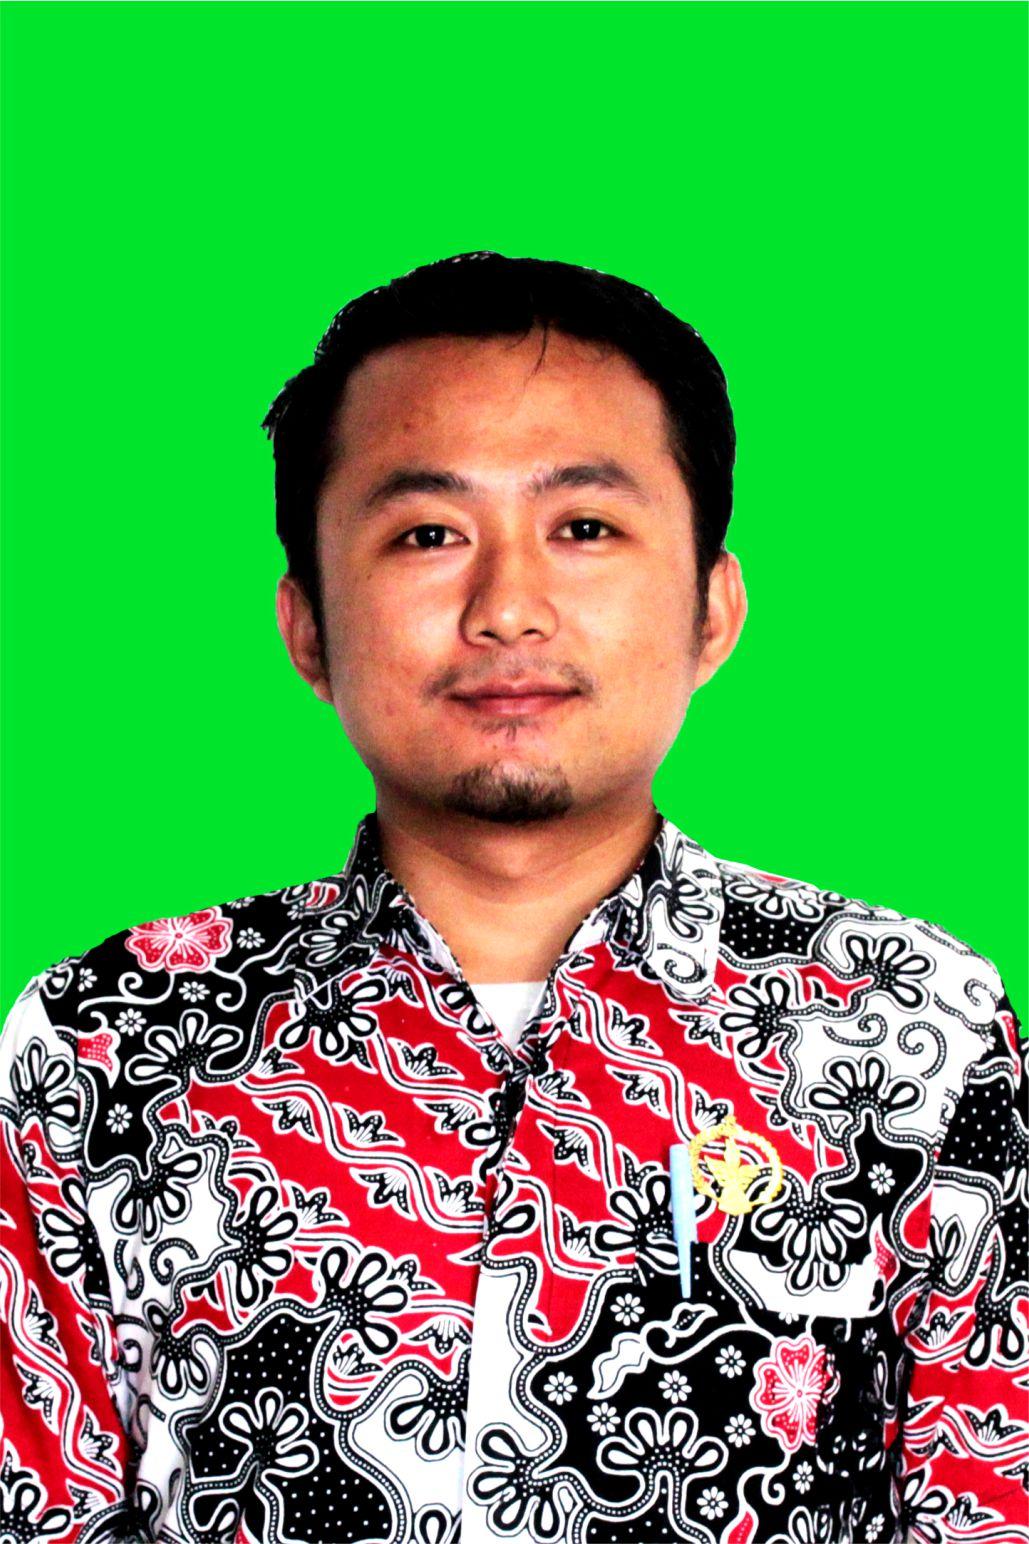 Staff Robi Sanusi, S.Pd SMK Taruna Harapan 1 Cipatat